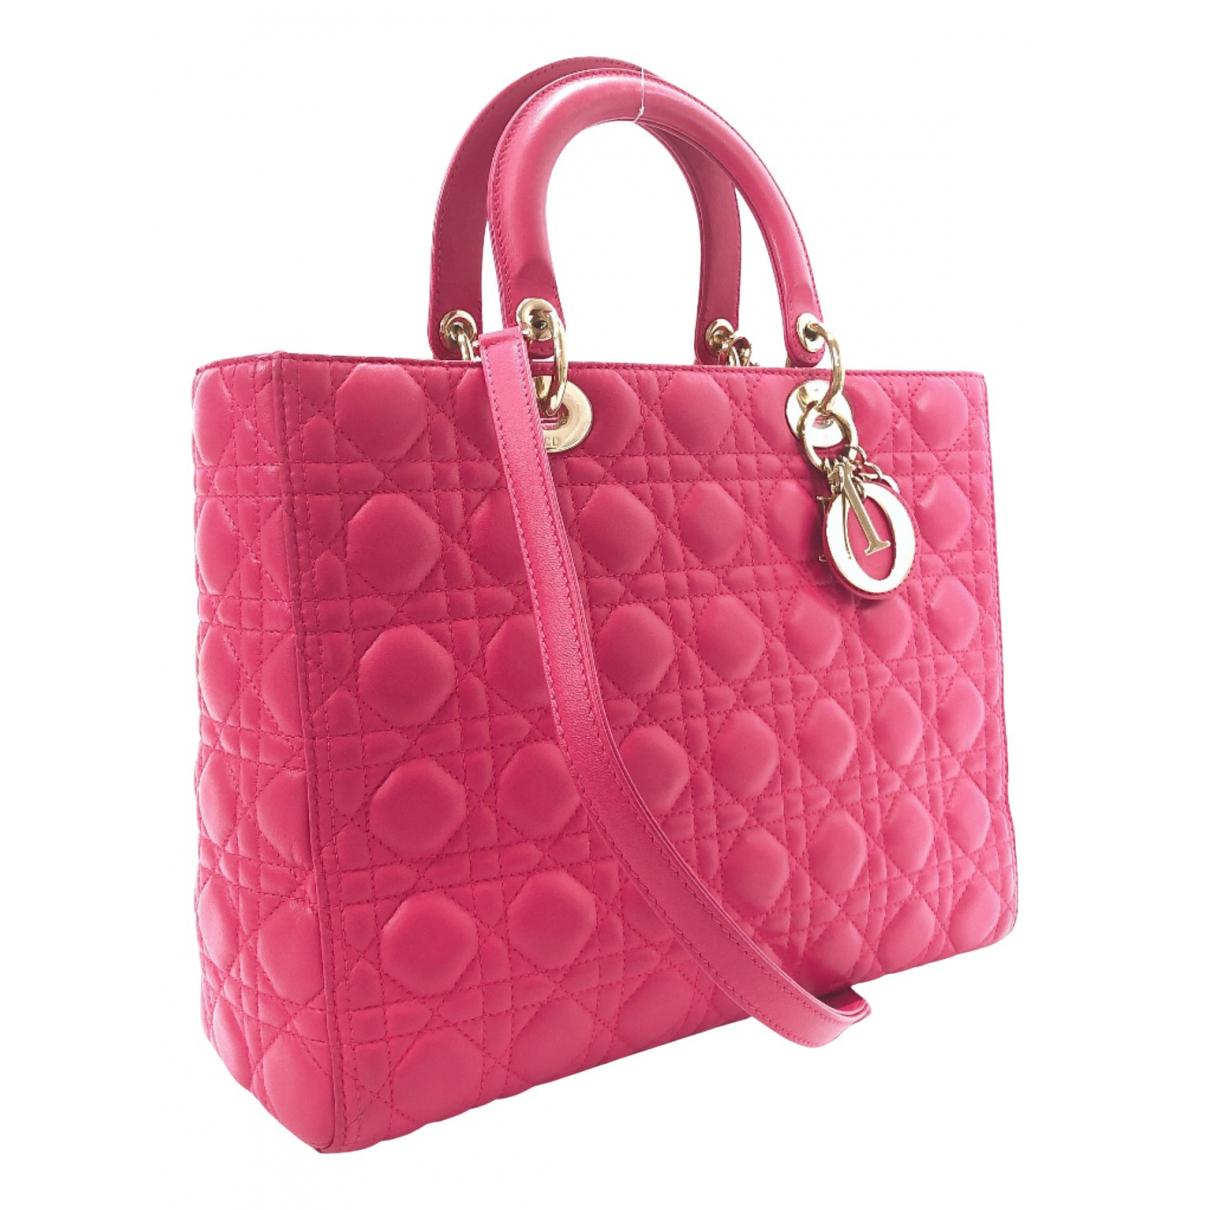 Dior Lady Dior Pink Leather handbag for Women N